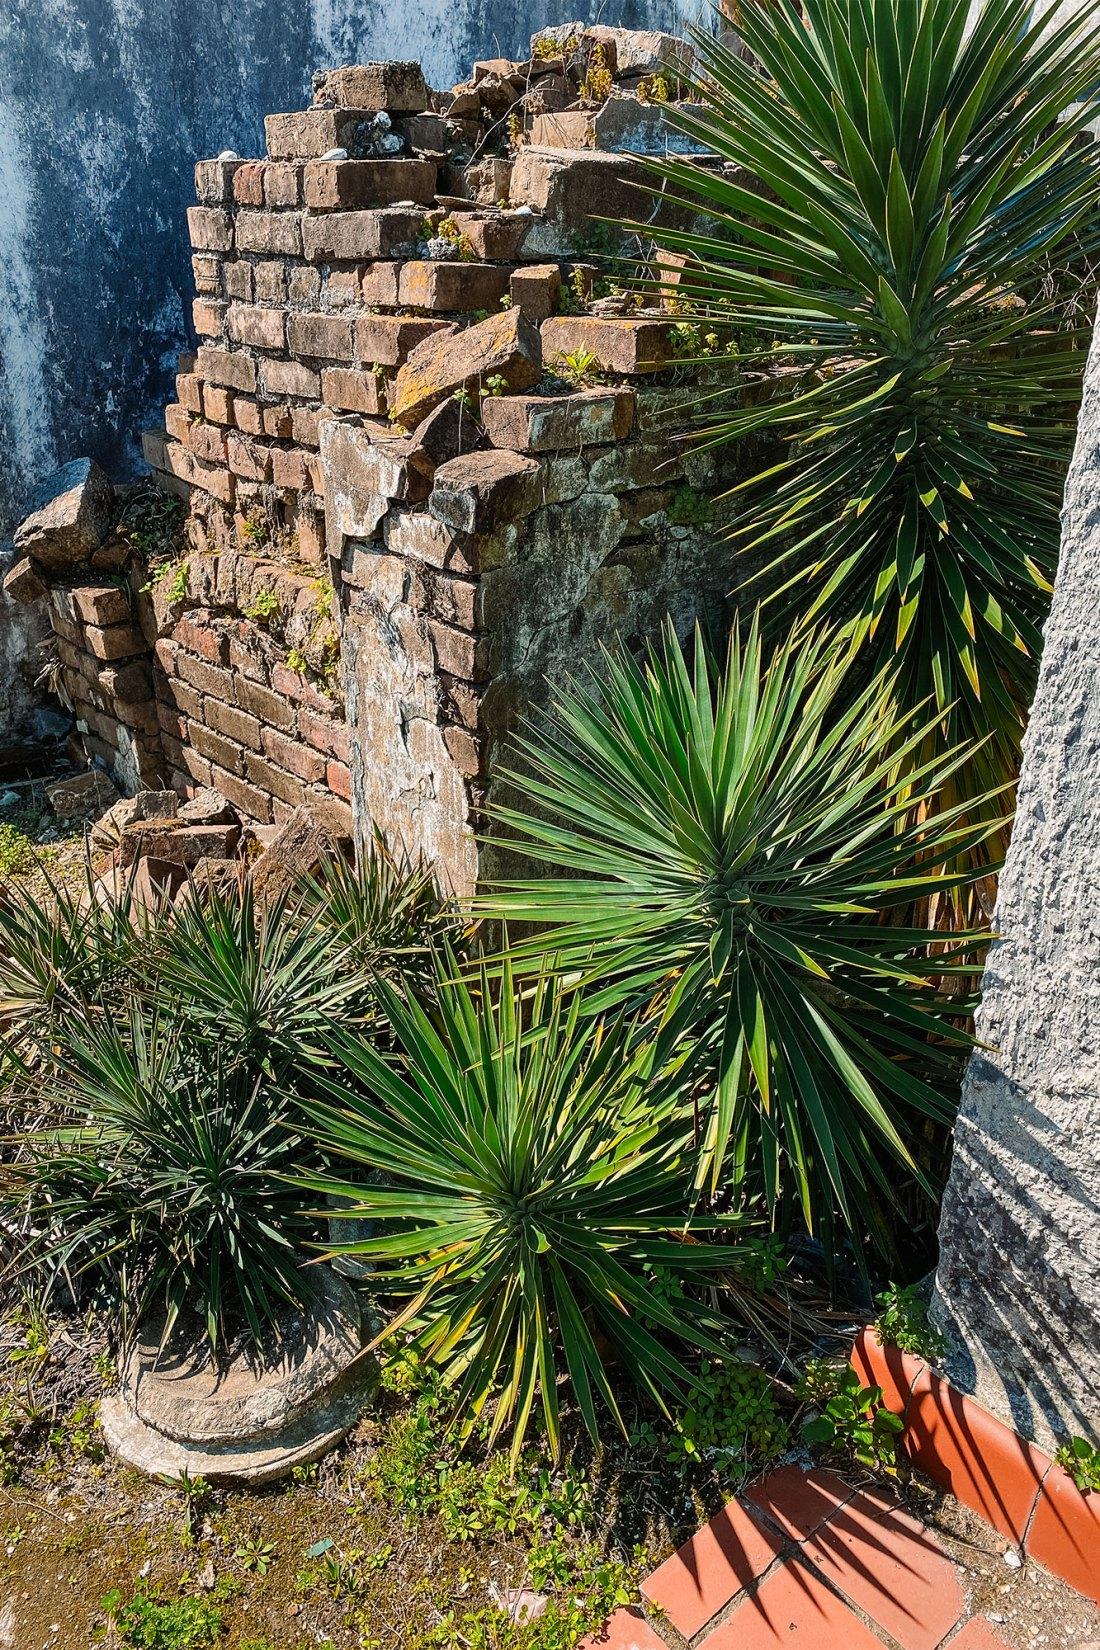 Greenery surrounding aging brick